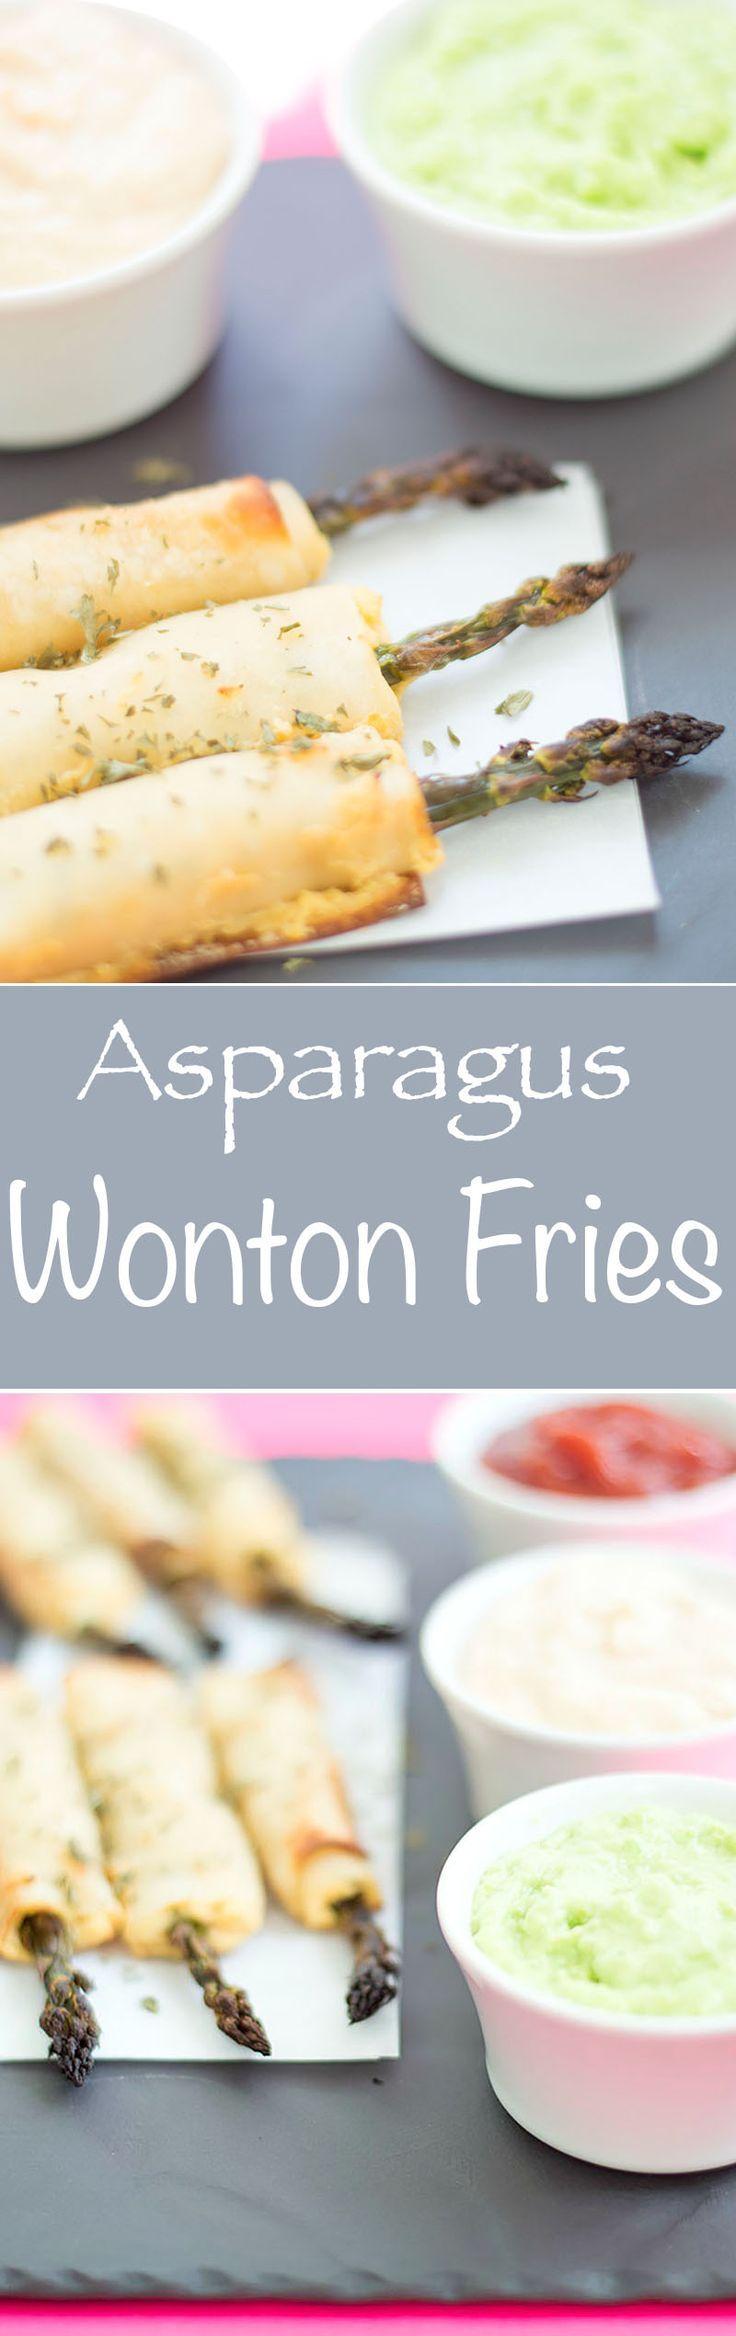 Asparagus Wonton Fries - easy to make + healthy baked. Spread Mango sriracha dip on the wontons, wrap it and roast. Simple, kid-friendly vegan snack.